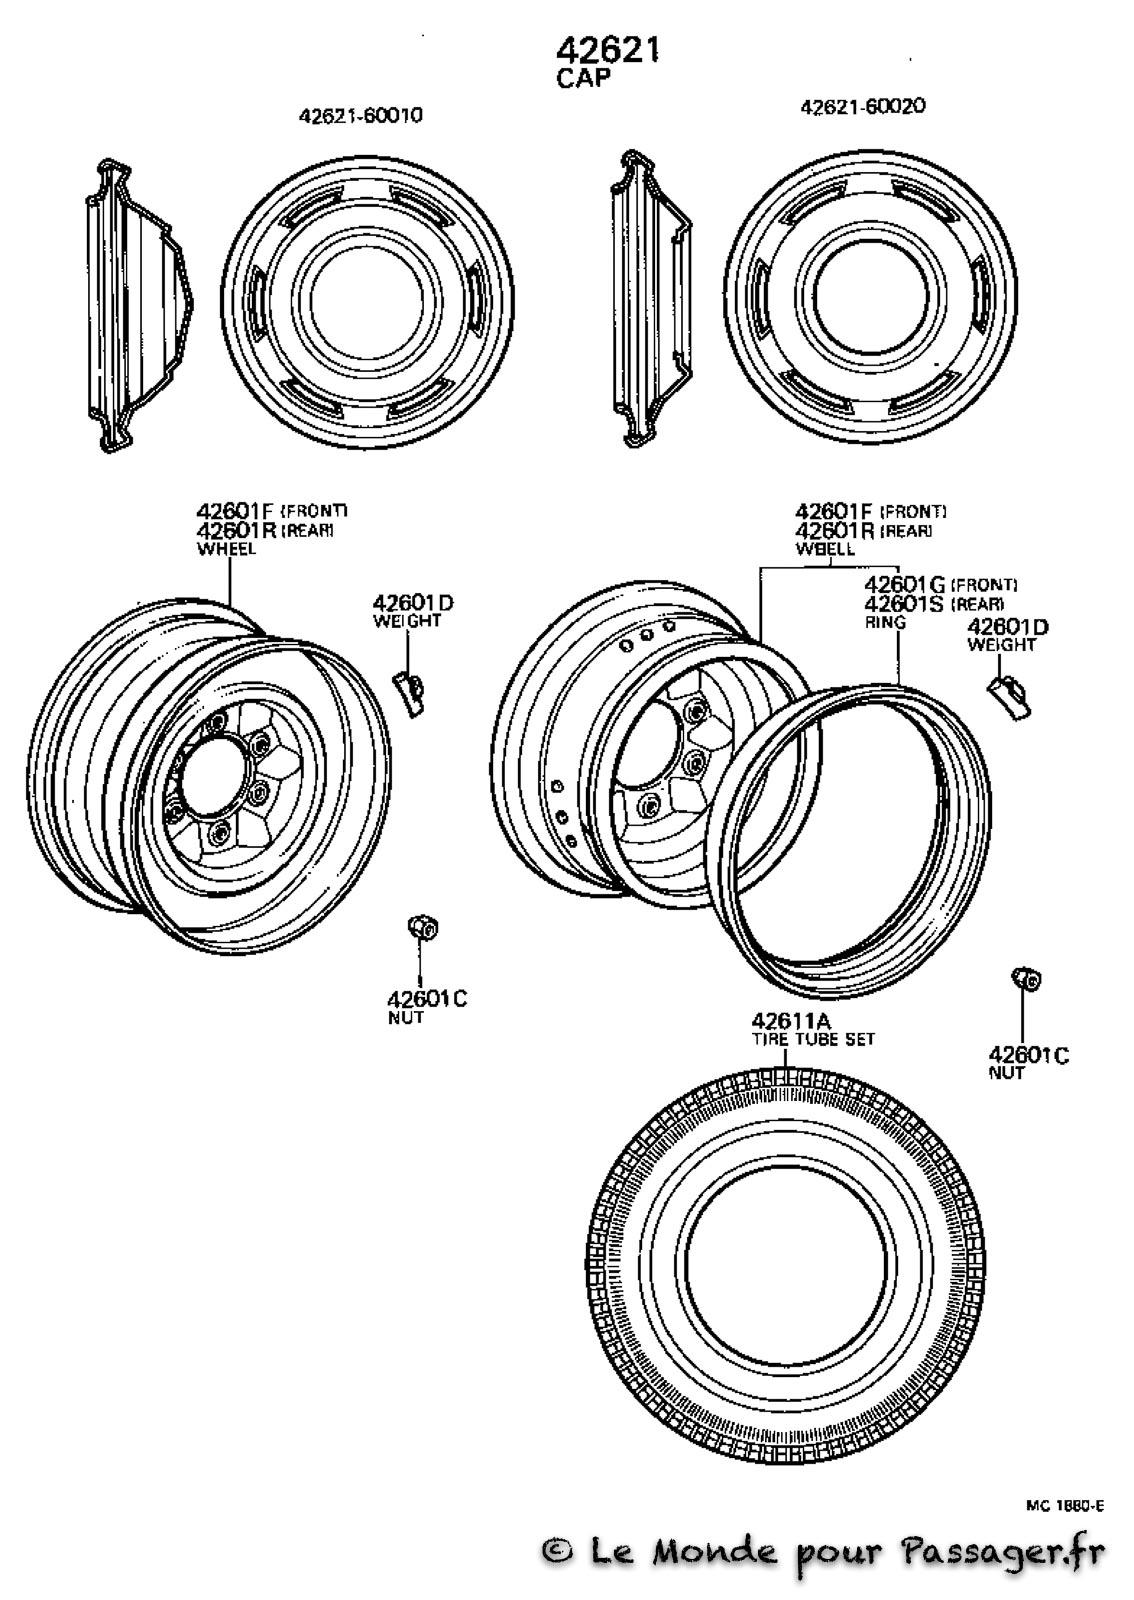 Fj55-Eclatés-Techniques109